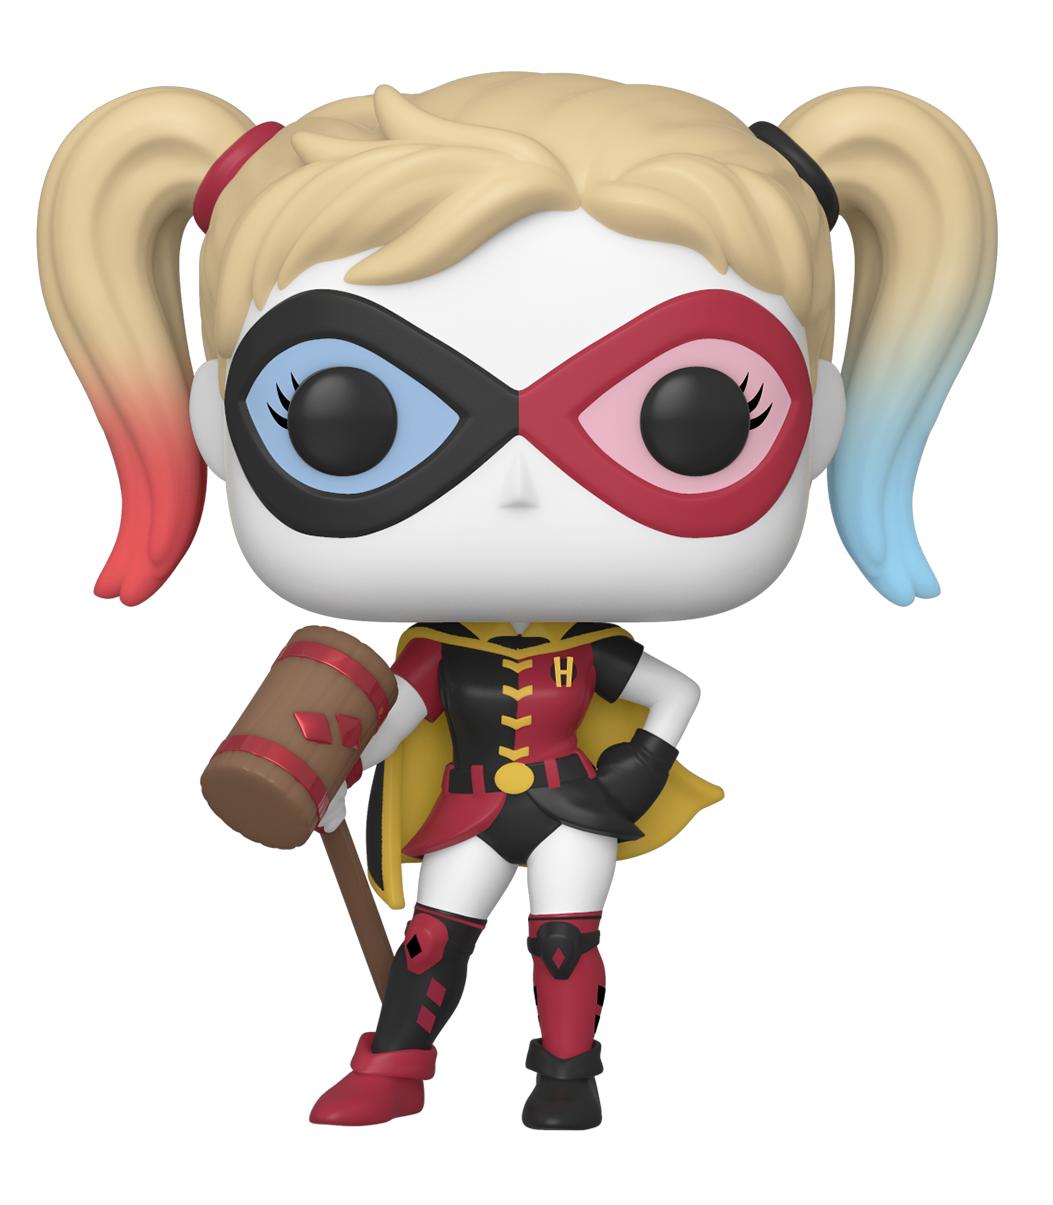 DC Rebirth - Harley Quinn (as Robin) Pop! Vinyl Figure image